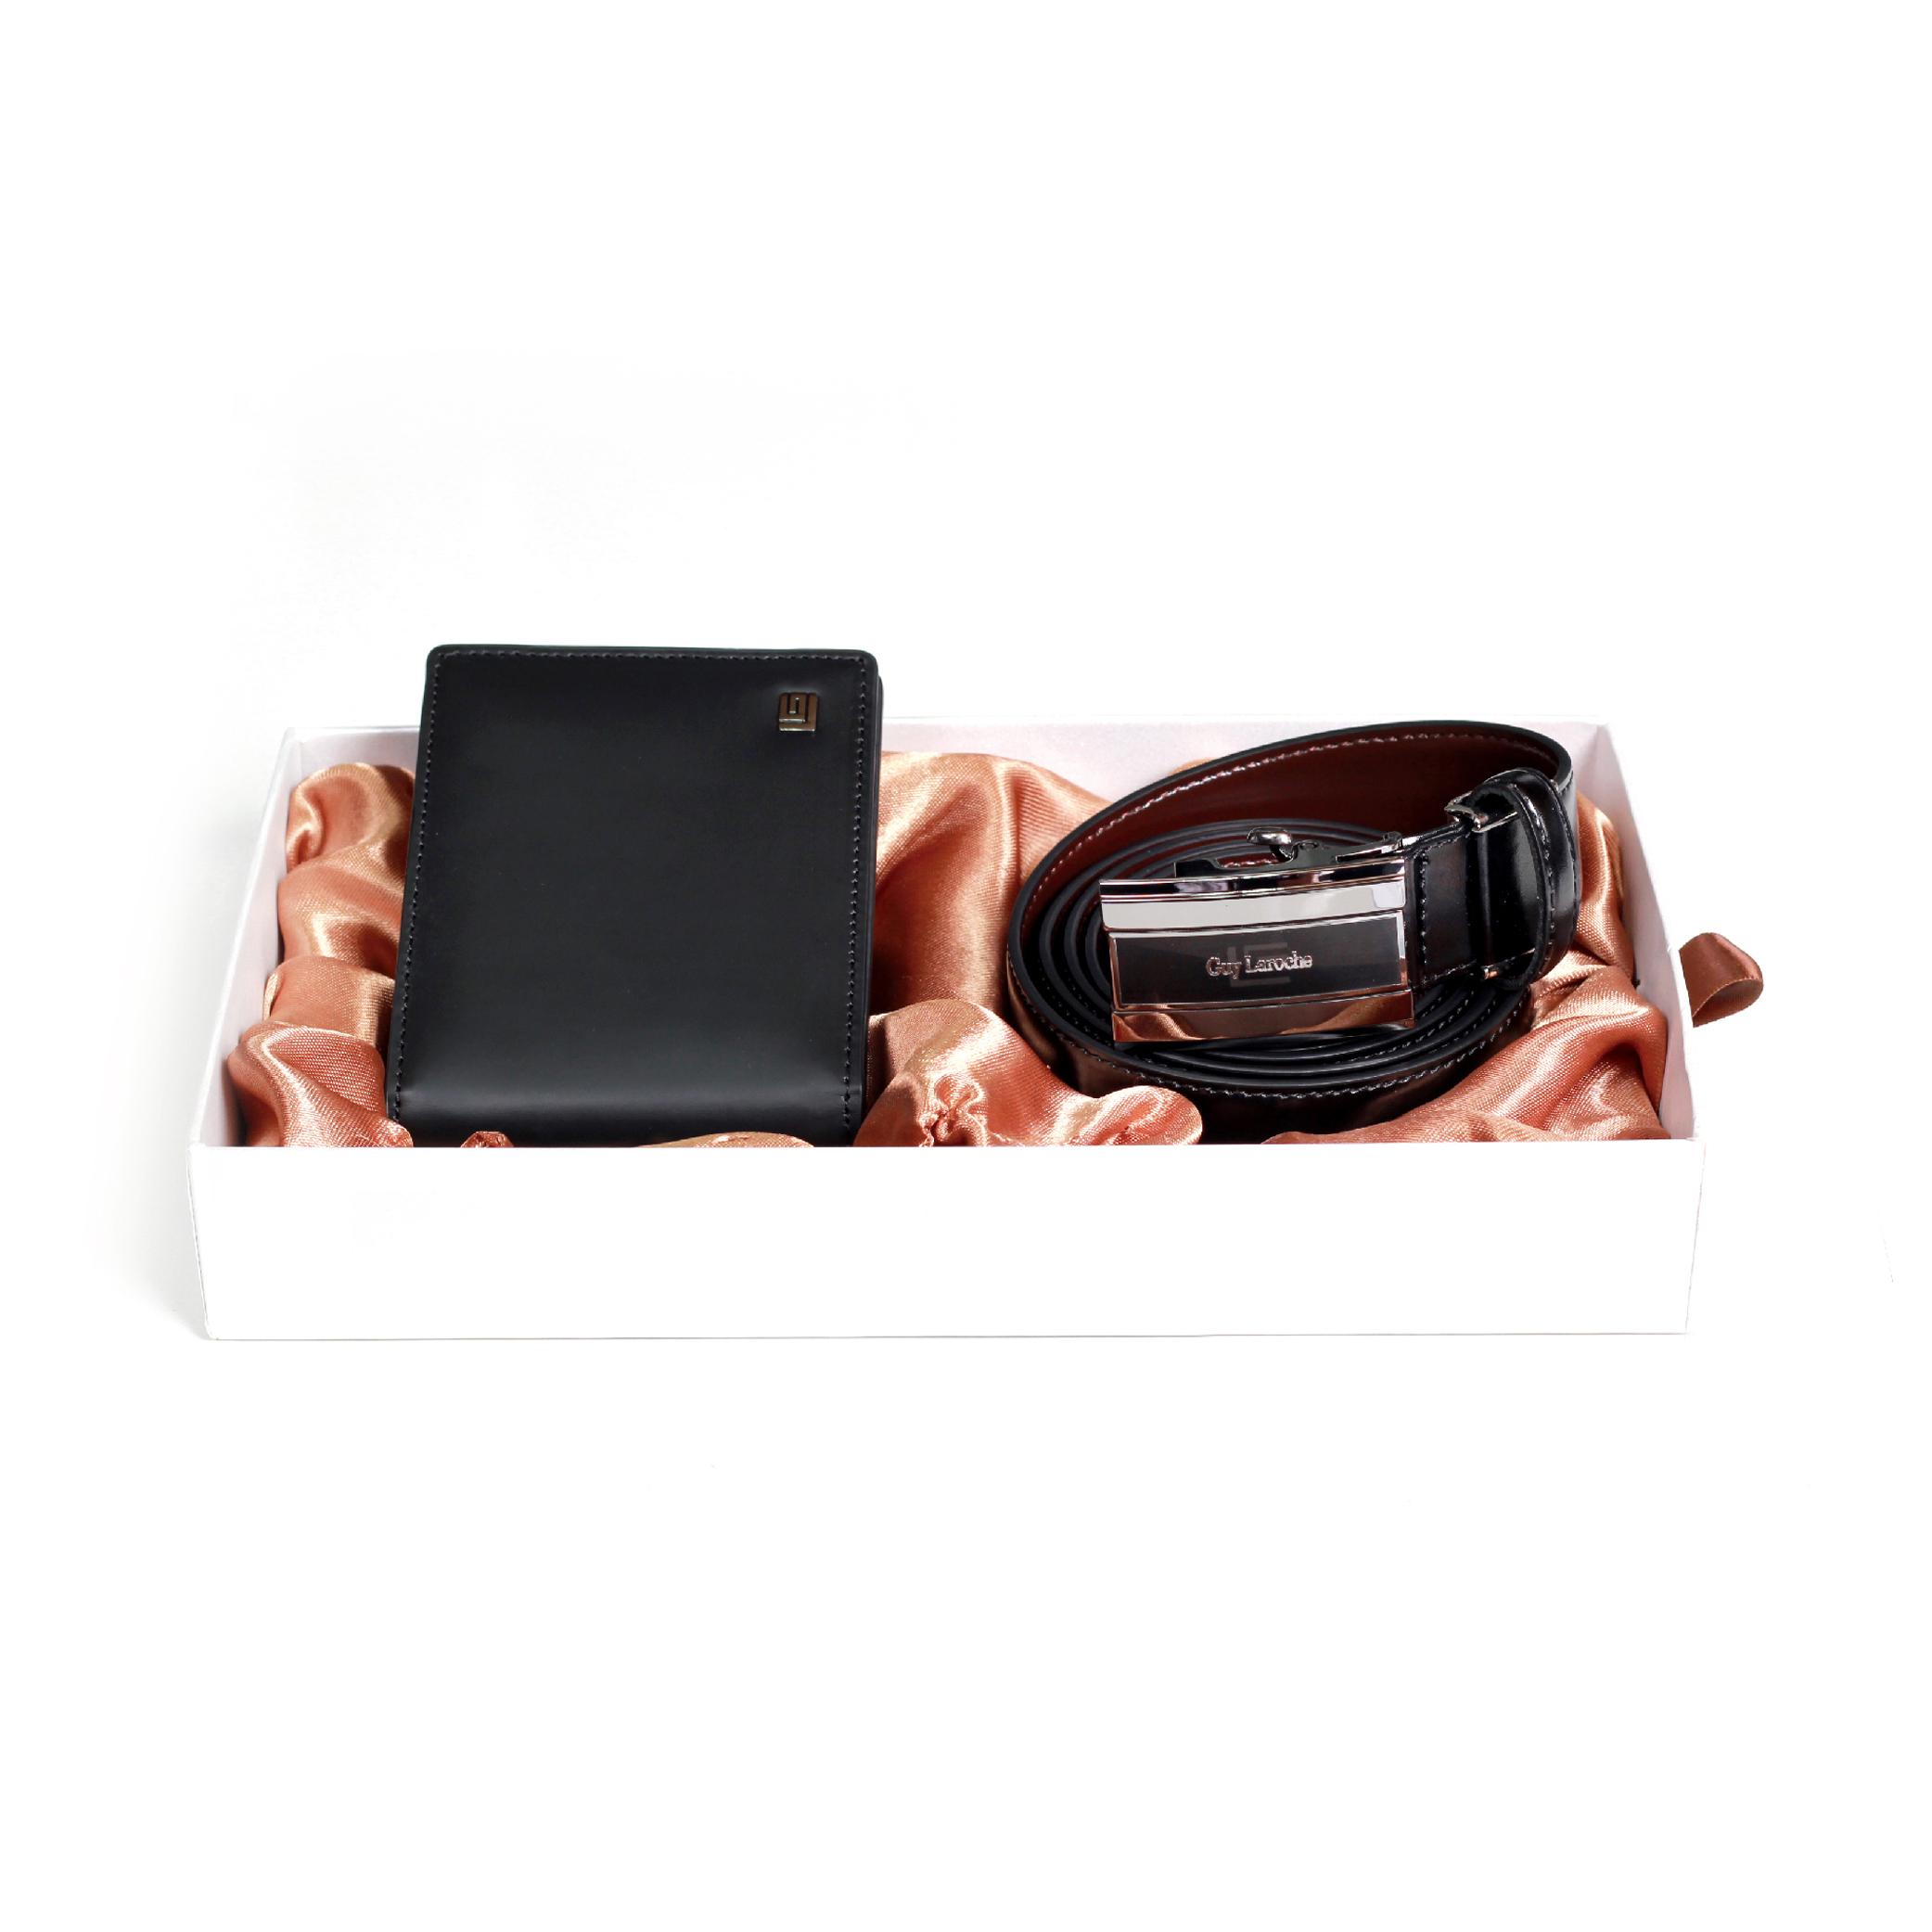 Guy Laroche  투명창반지갑 + 자동벨트 선물세트GL-BM-003 GL-BT-010